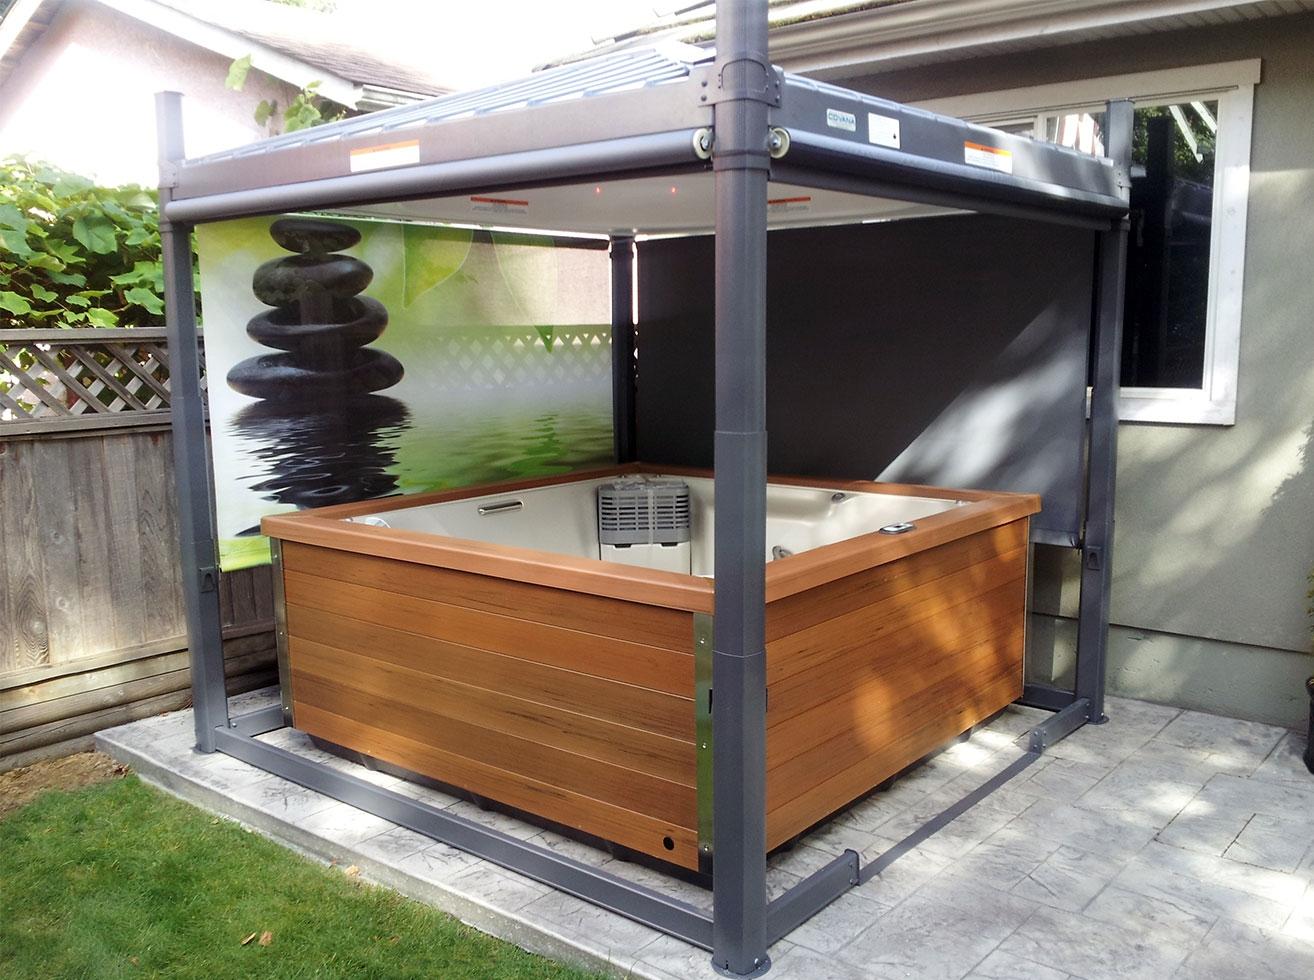 gazebo-oasis-spa-ouvert-store-zen-terrasse